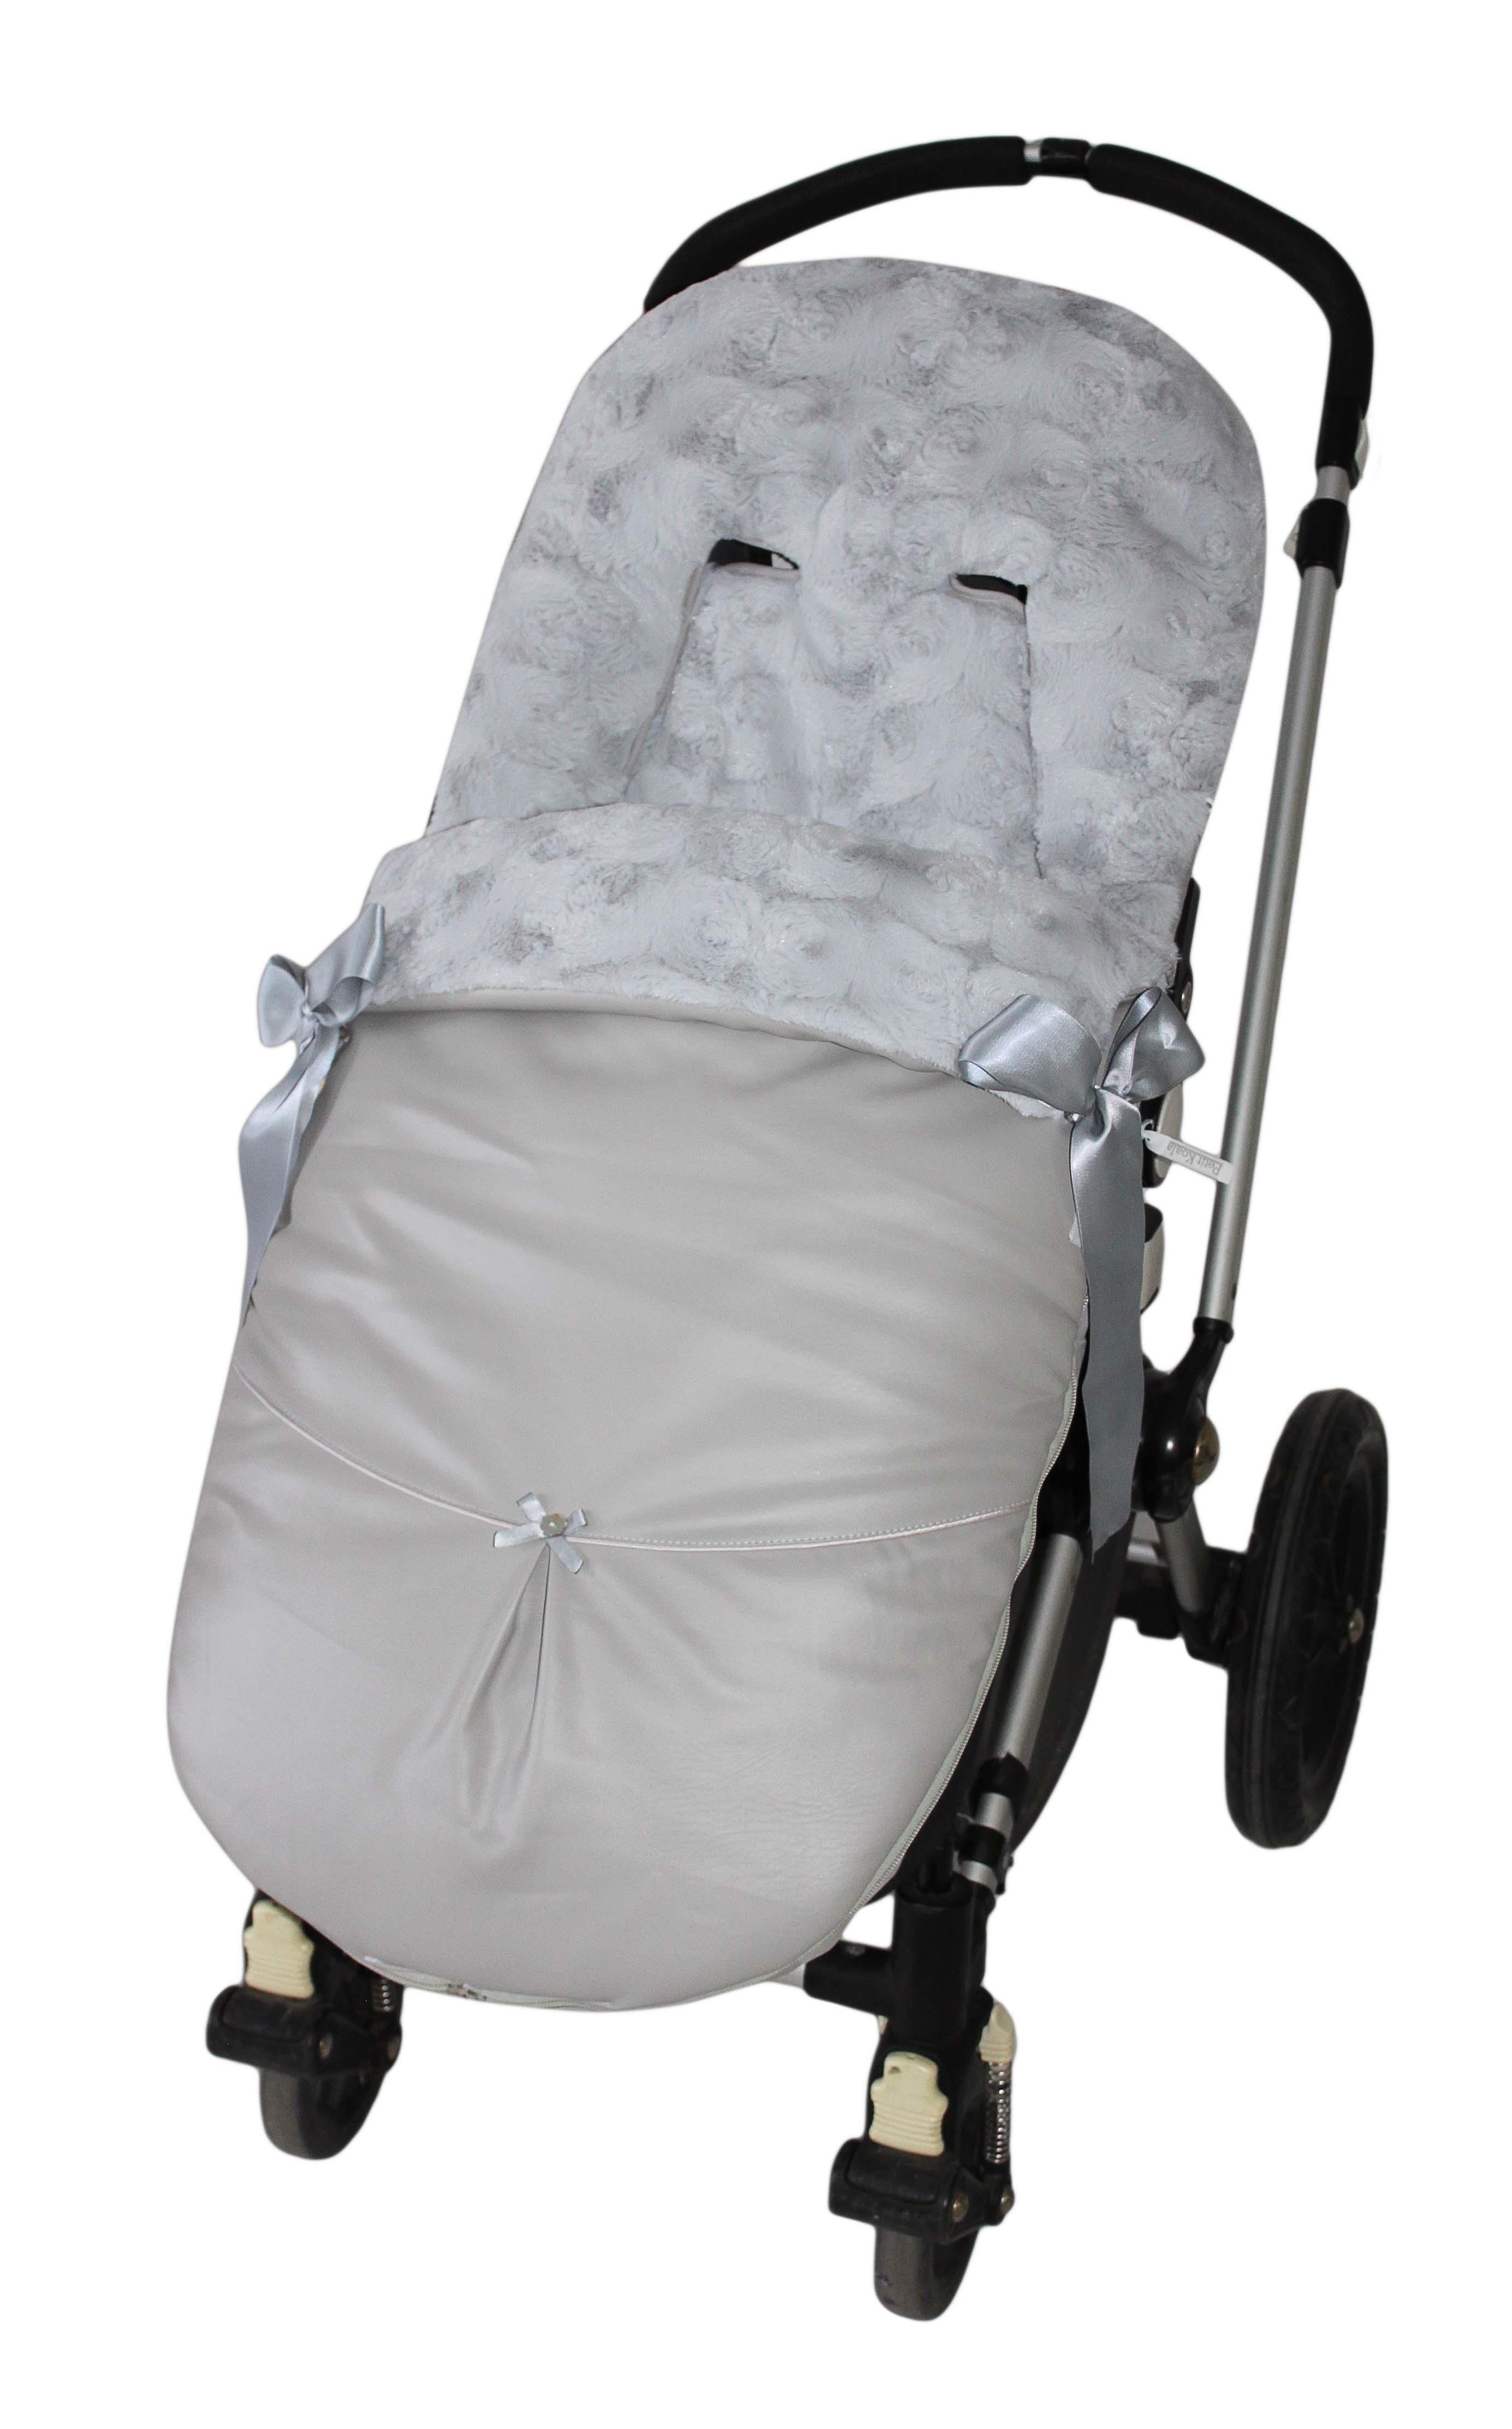 Saco bugaboo dakota gris pelo roseton gris saco bugaboo invierno dakota gri 116 16 sacos - Sacos silla bebe invierno ...